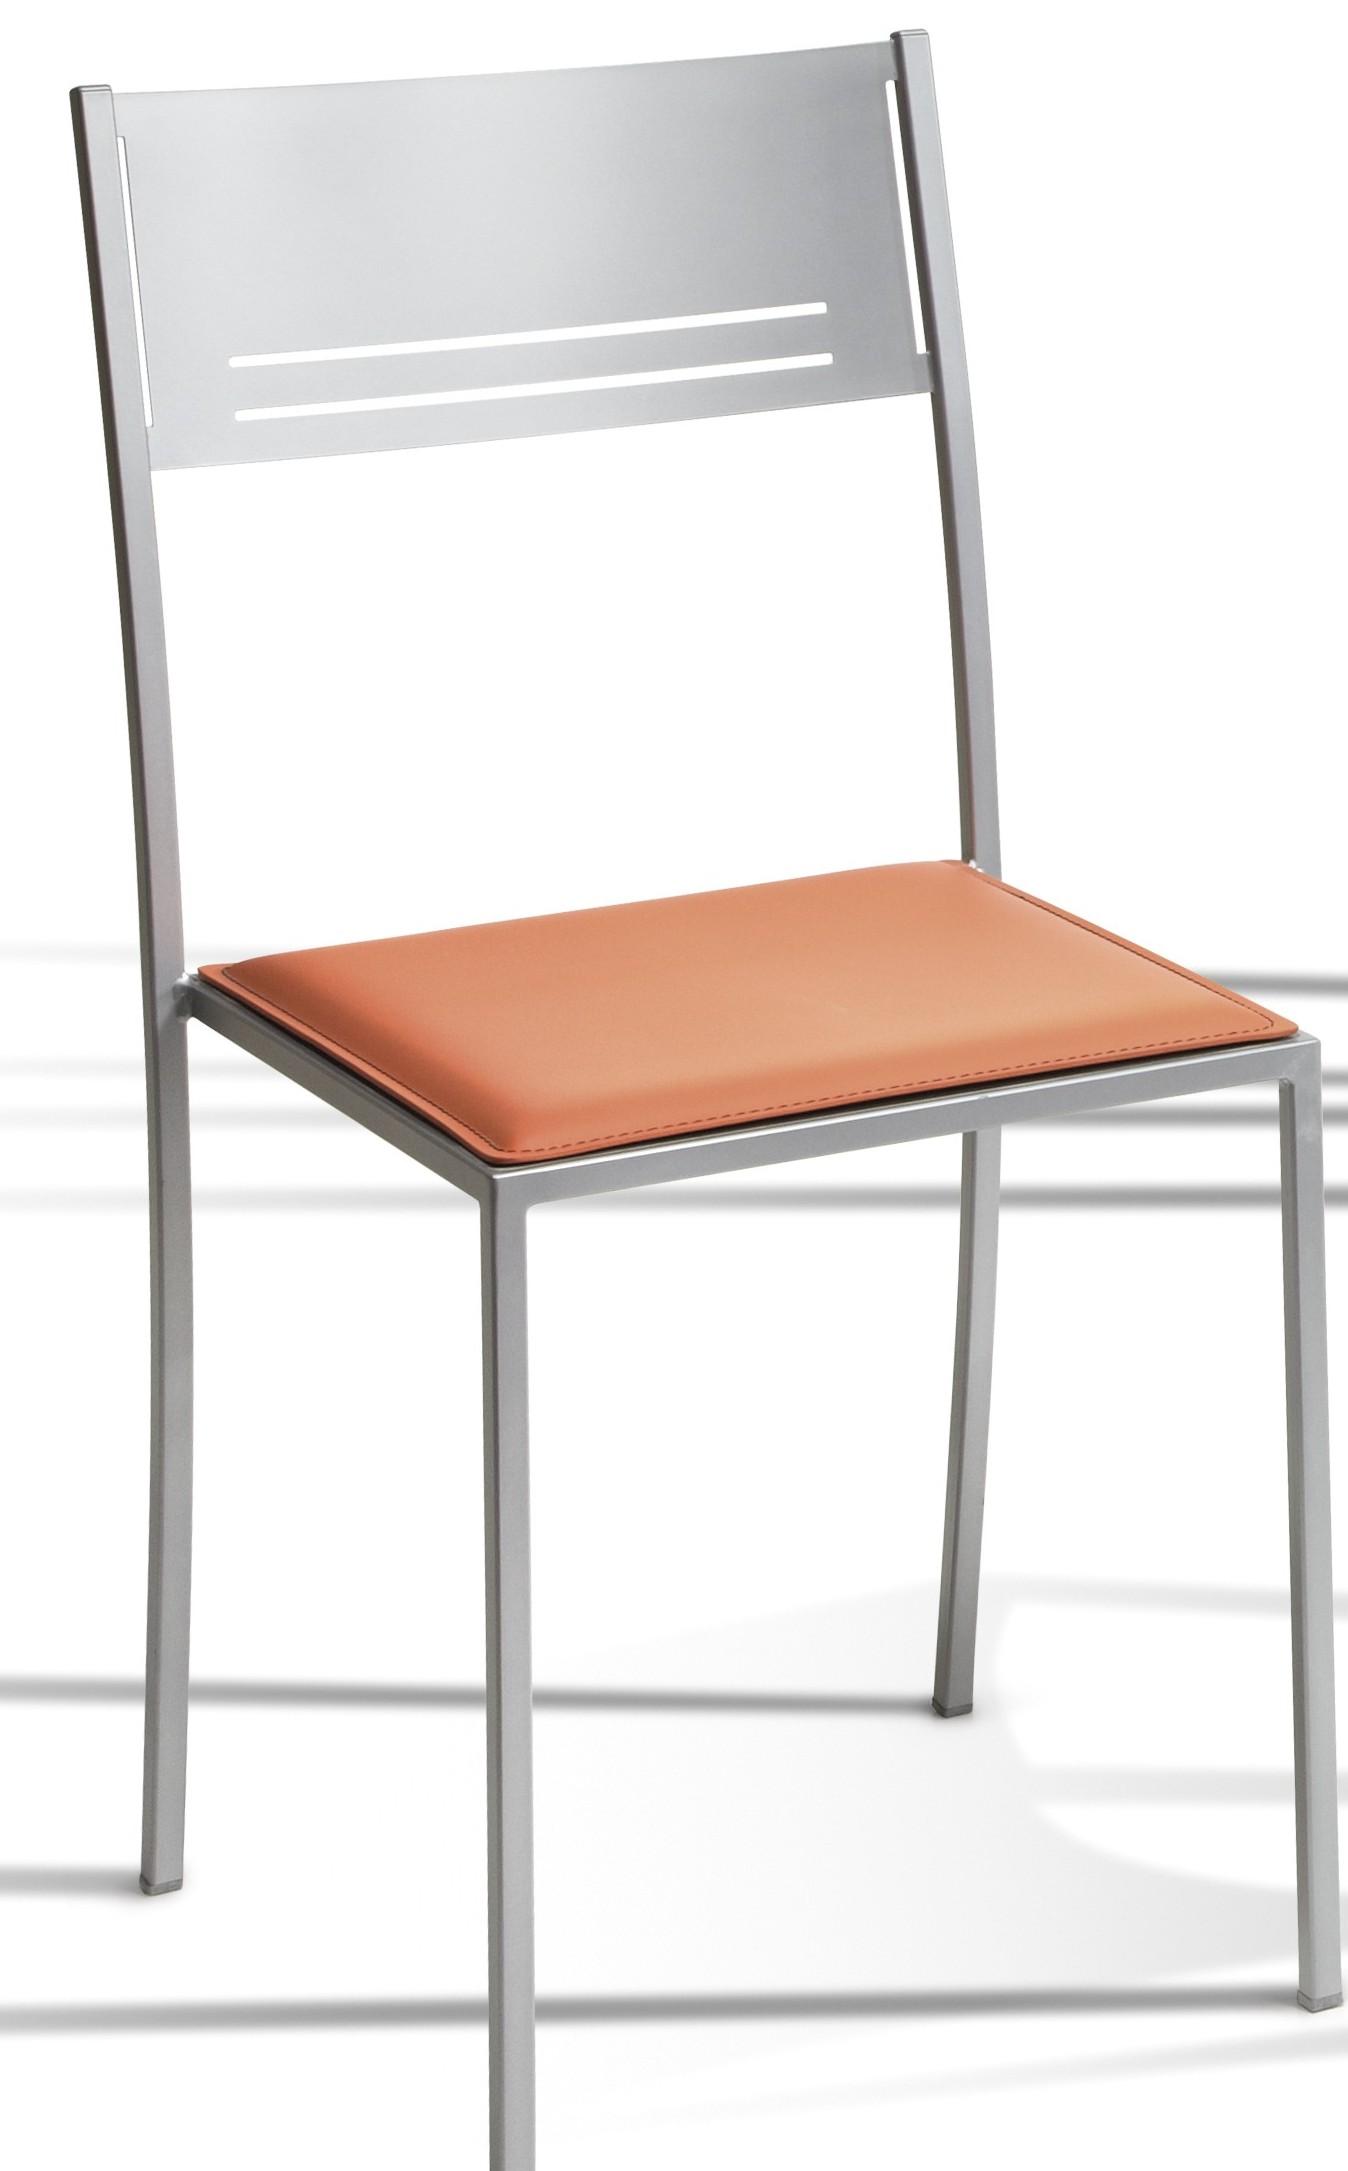 Mesas de cocina originales sillas de cocina modernas baratas for Sillas modernas precios